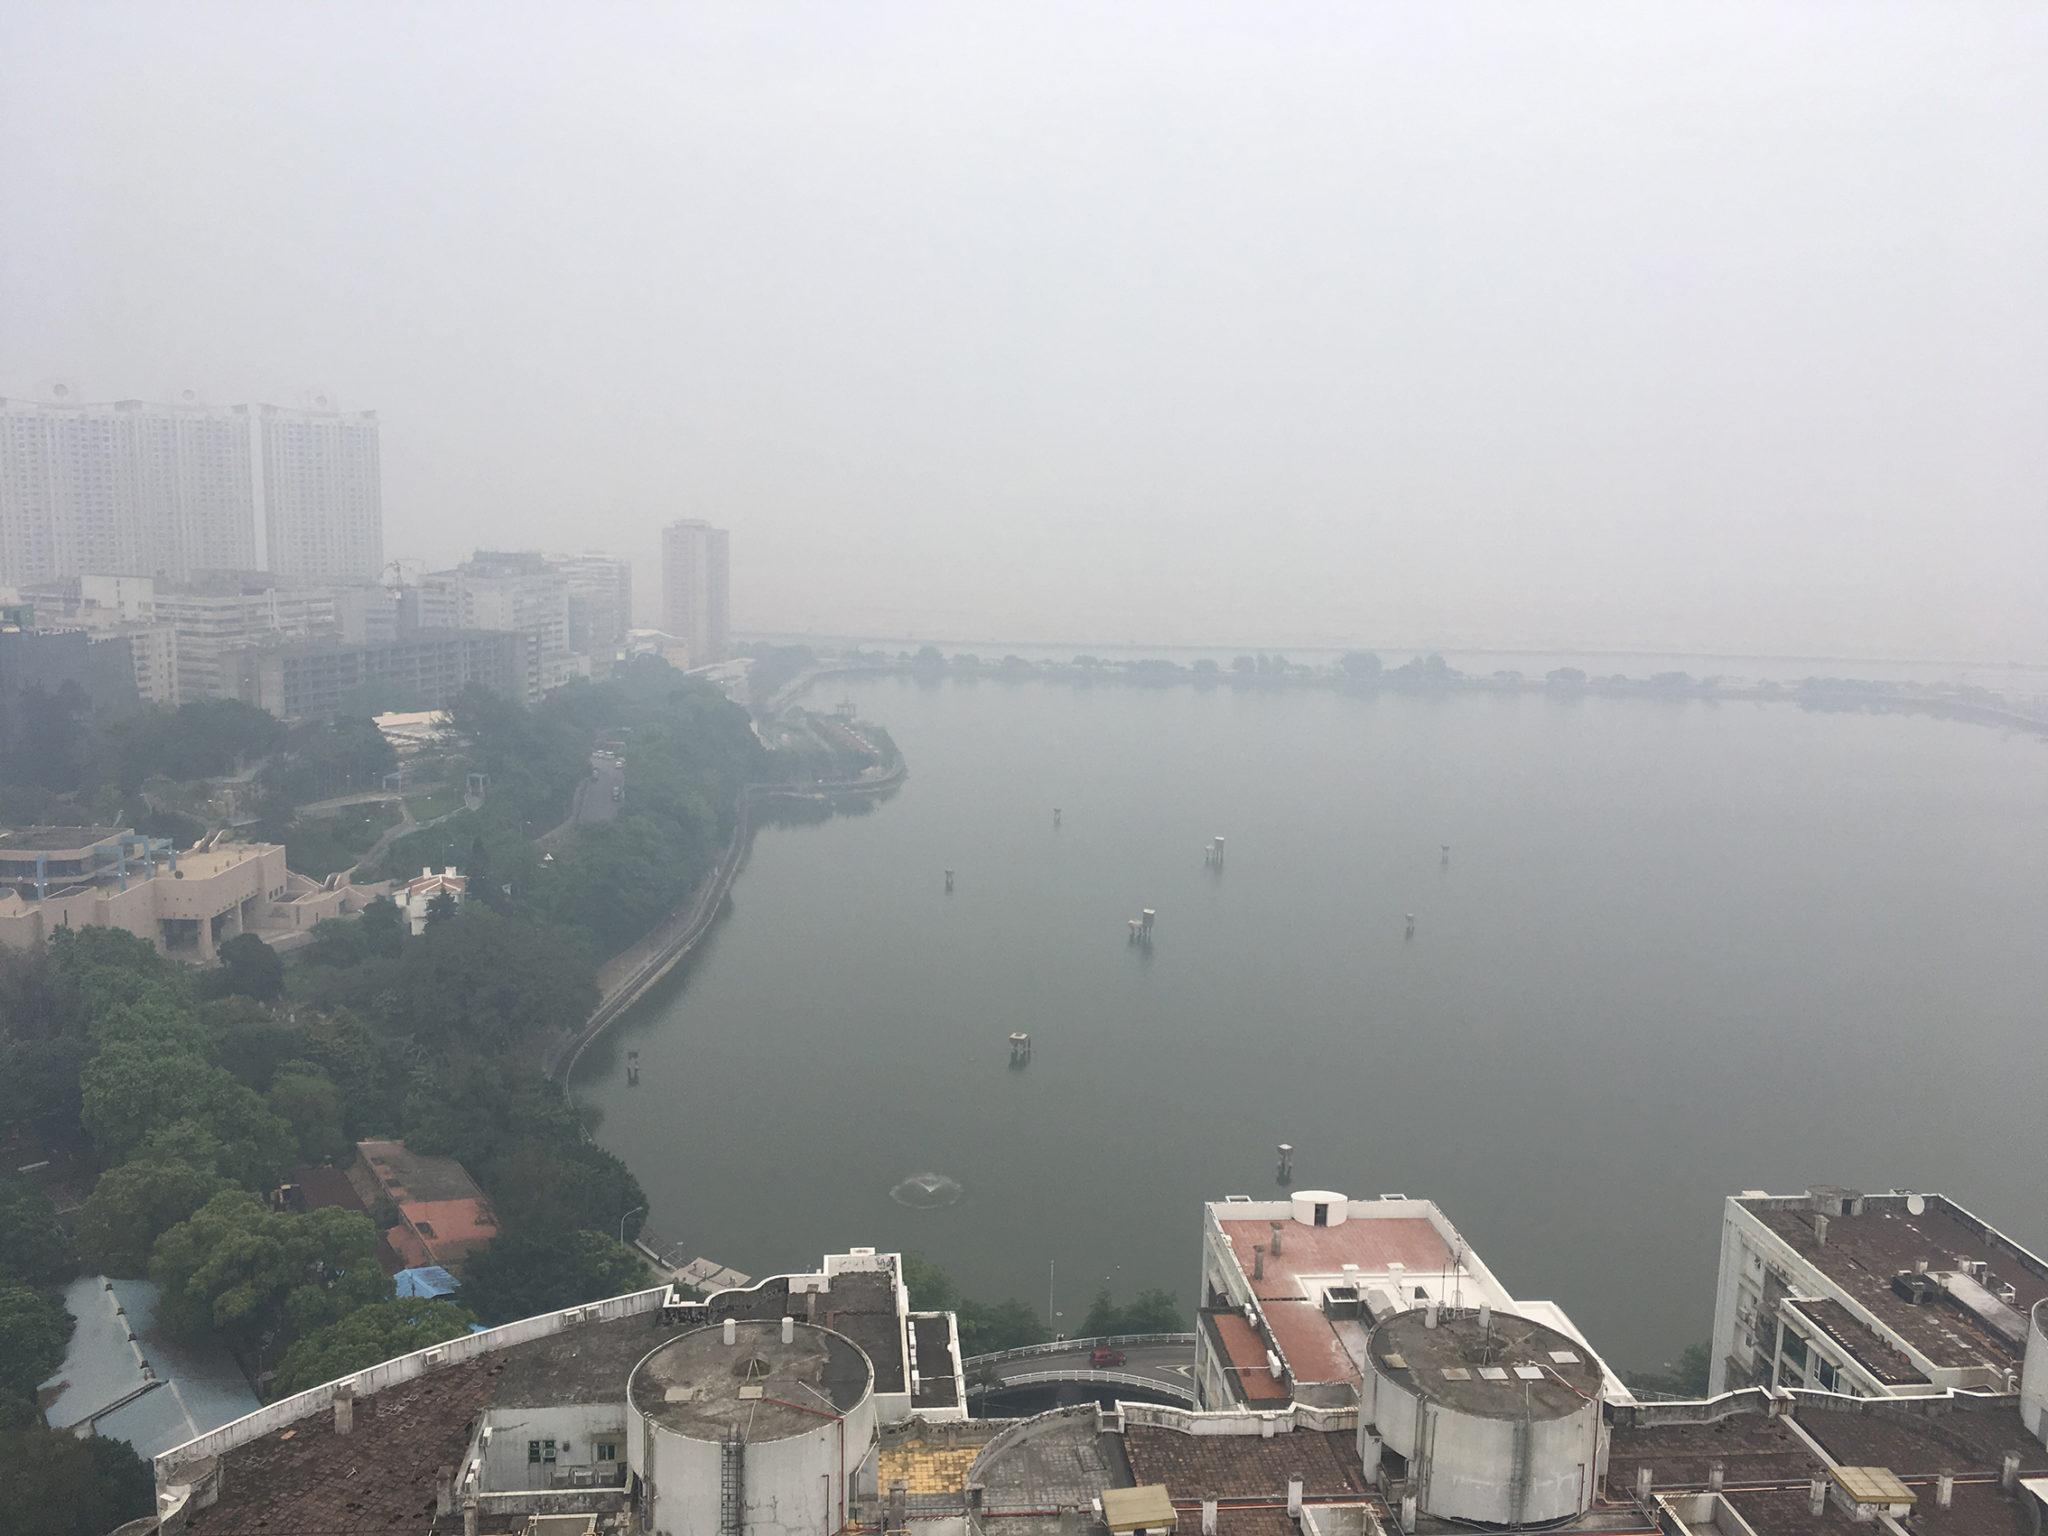 Ambiente | Macau volta a registar um nível alarmante de partículas poluentes